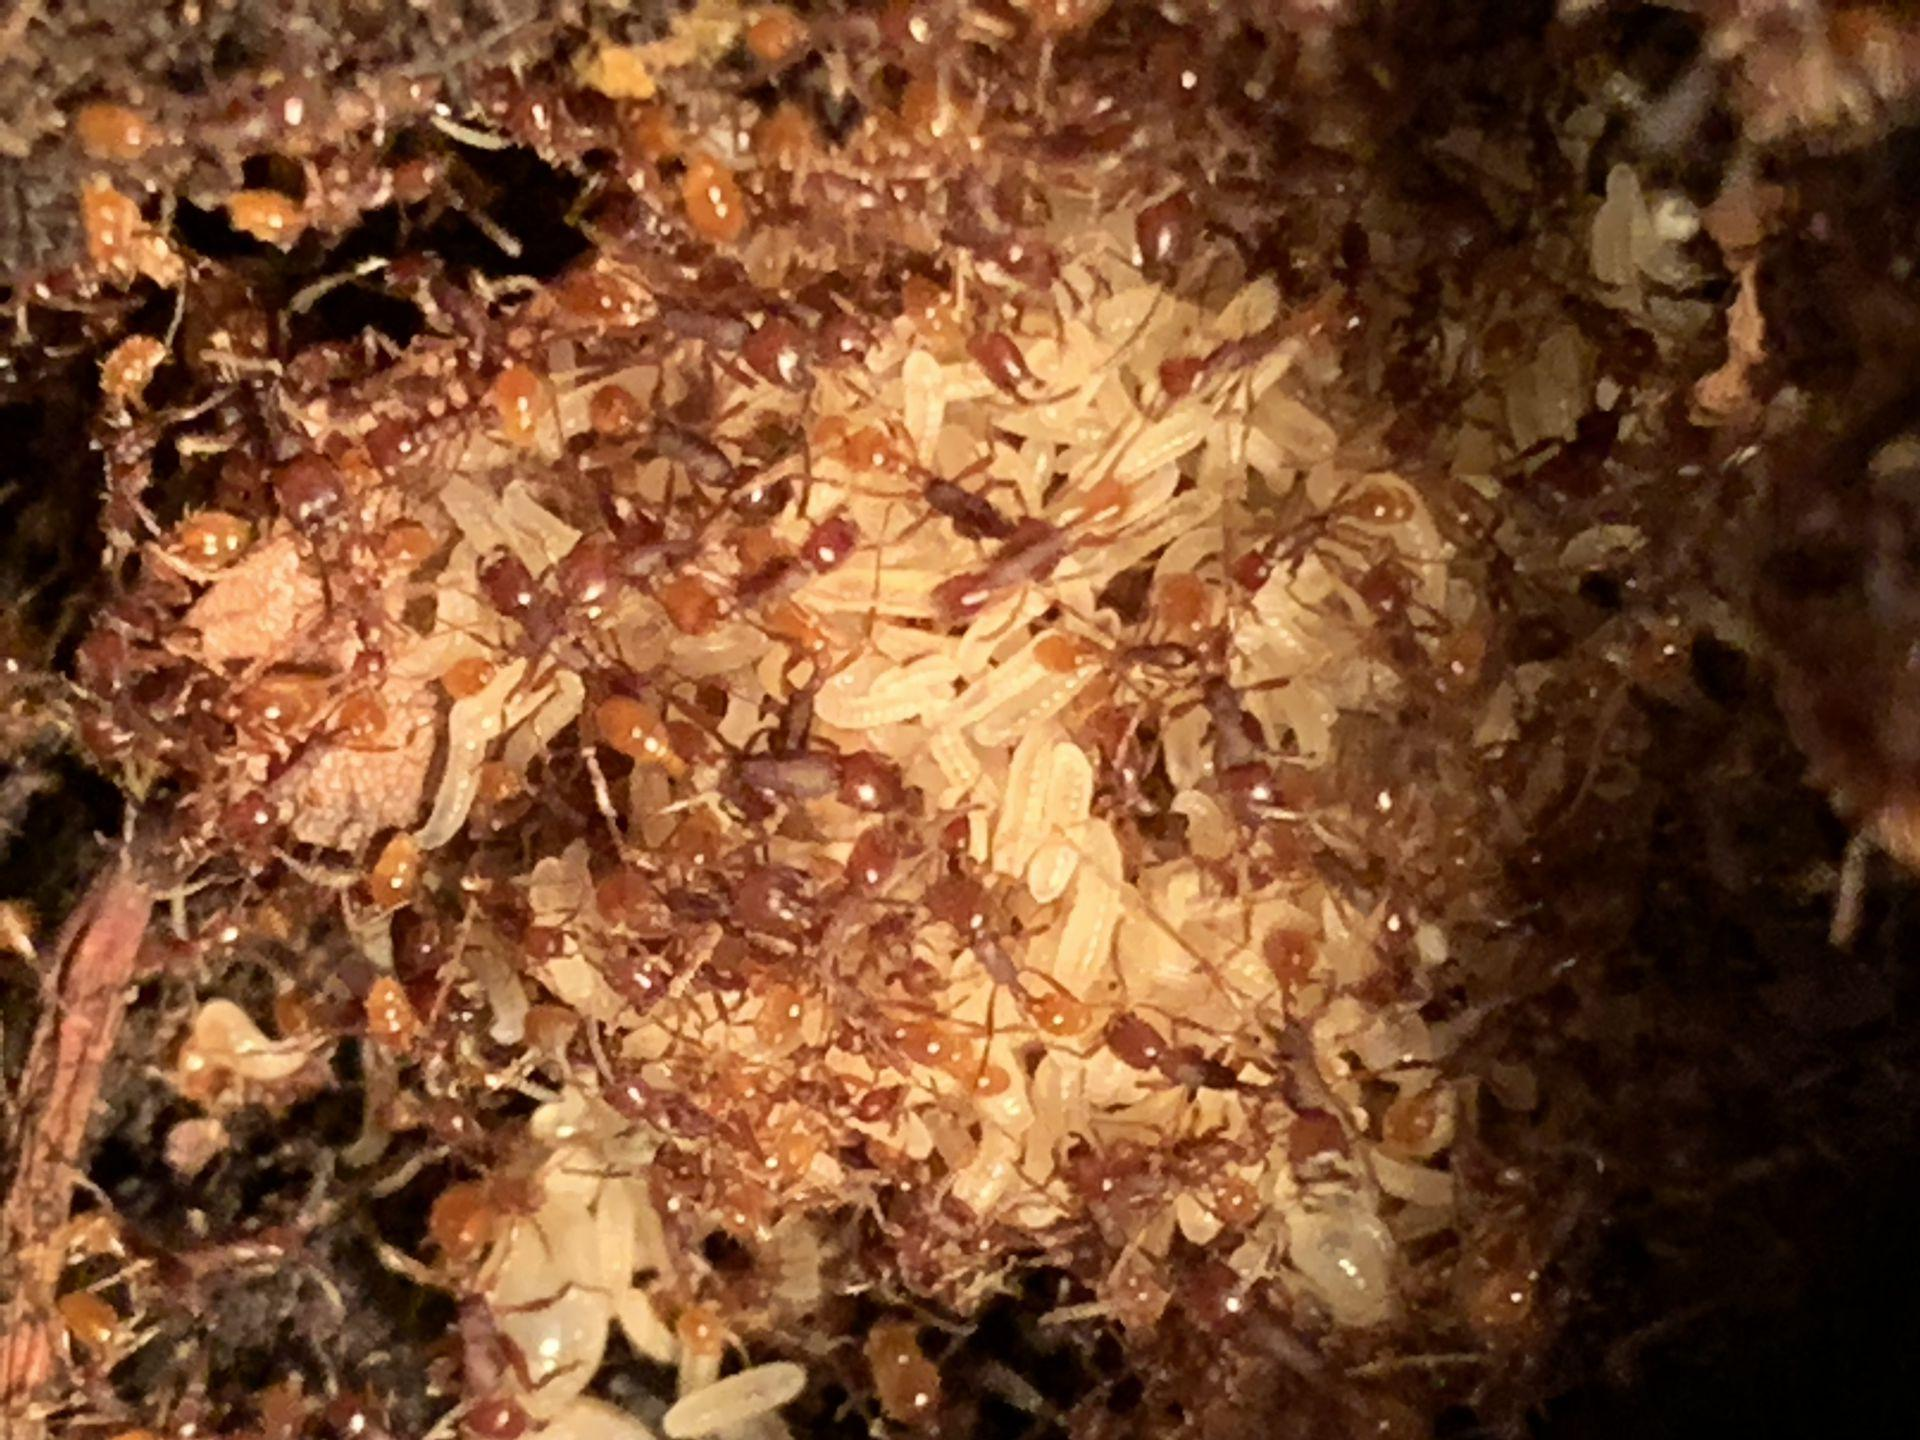 N.opacithorax larvae1